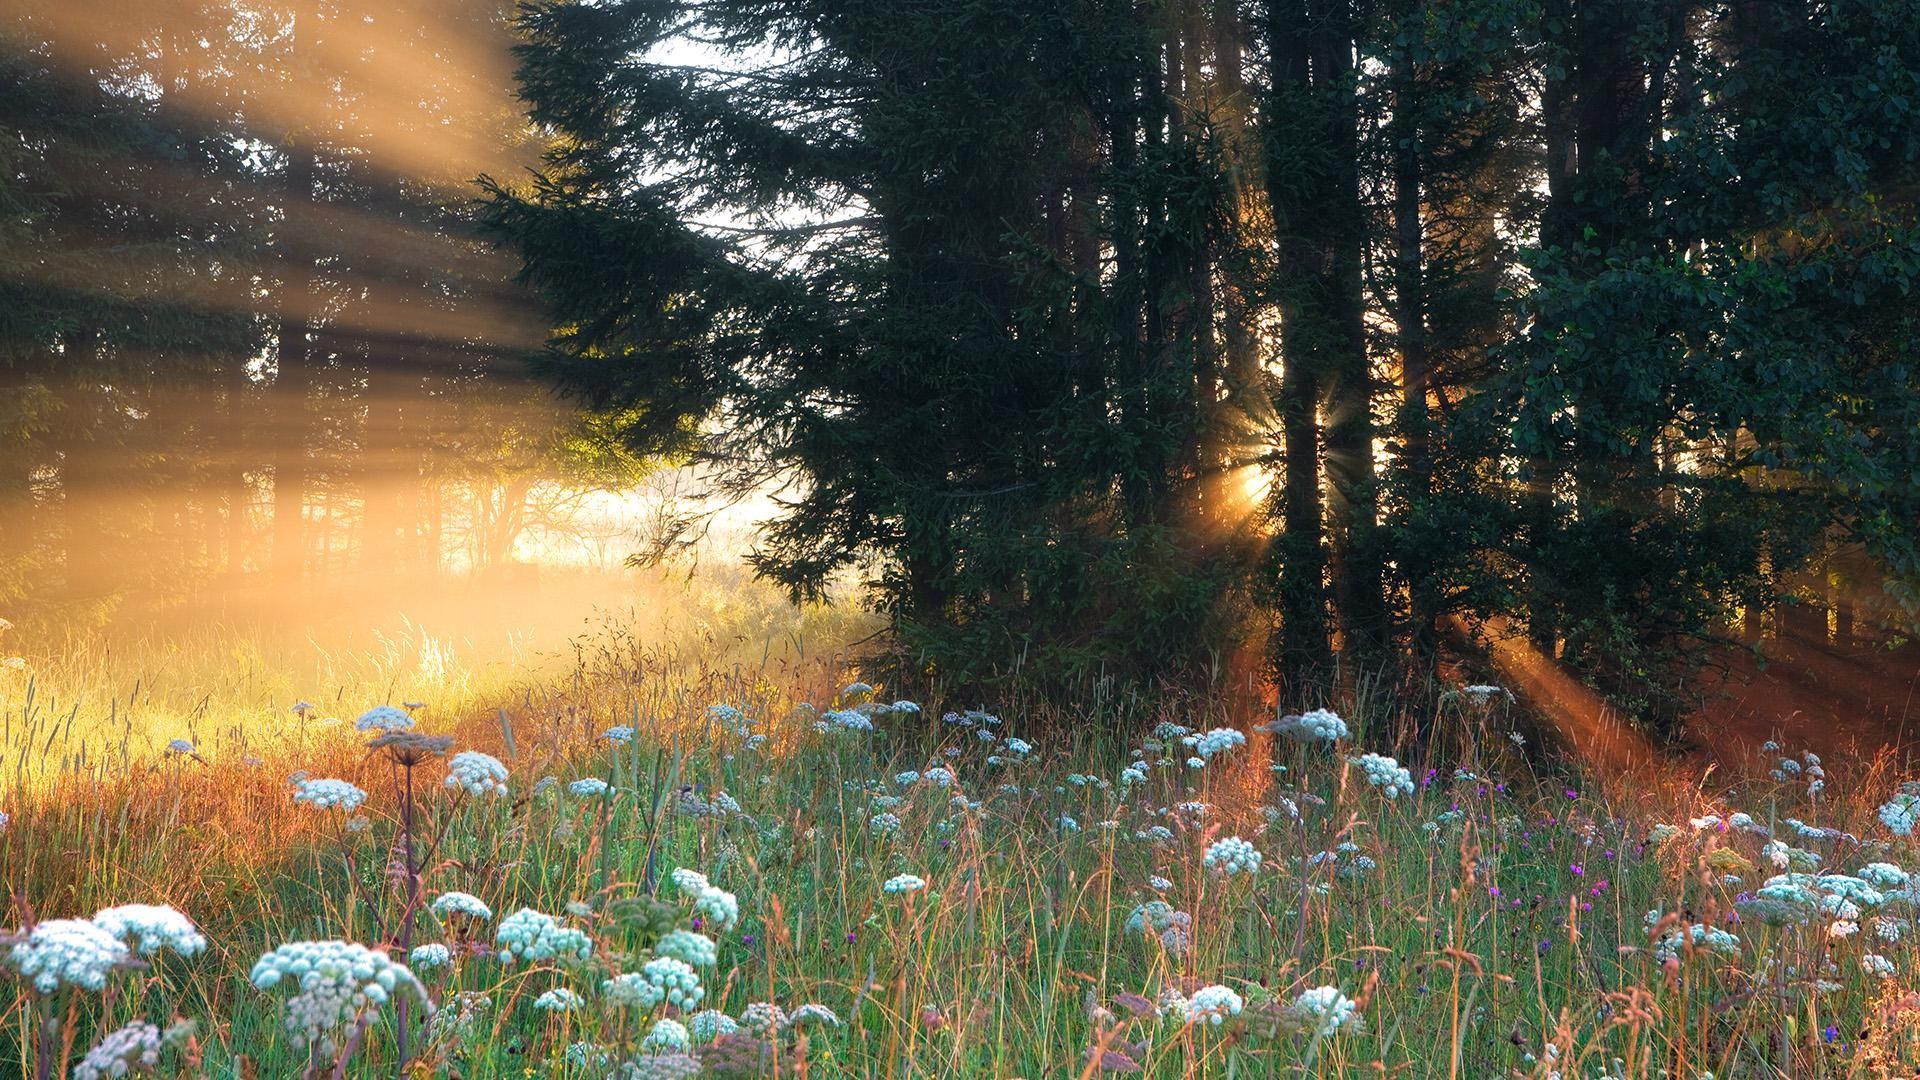 Beautiful Forest Wallpaper 36808